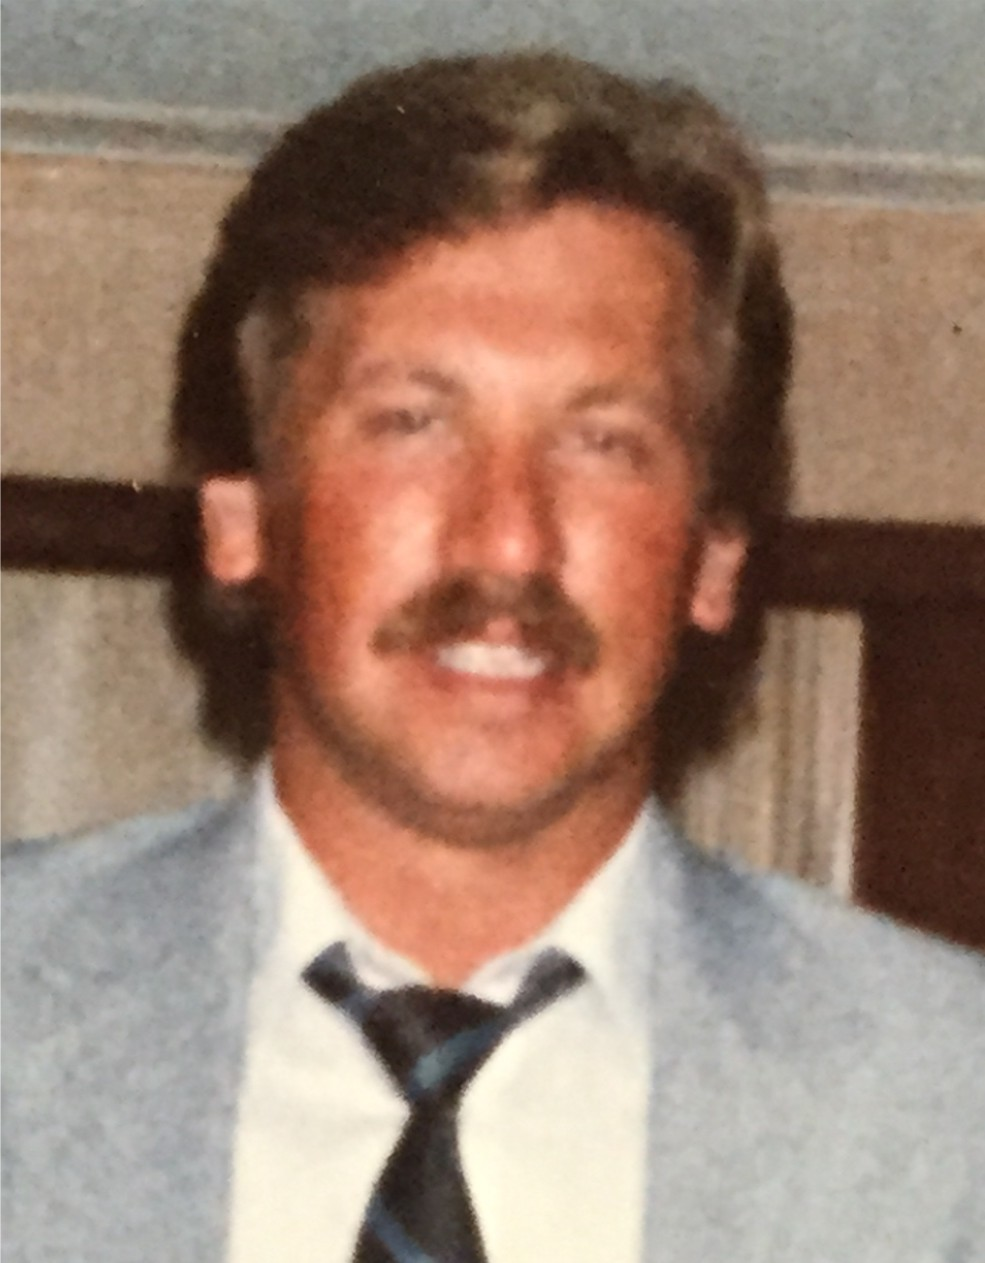 David E. Gindlesperger